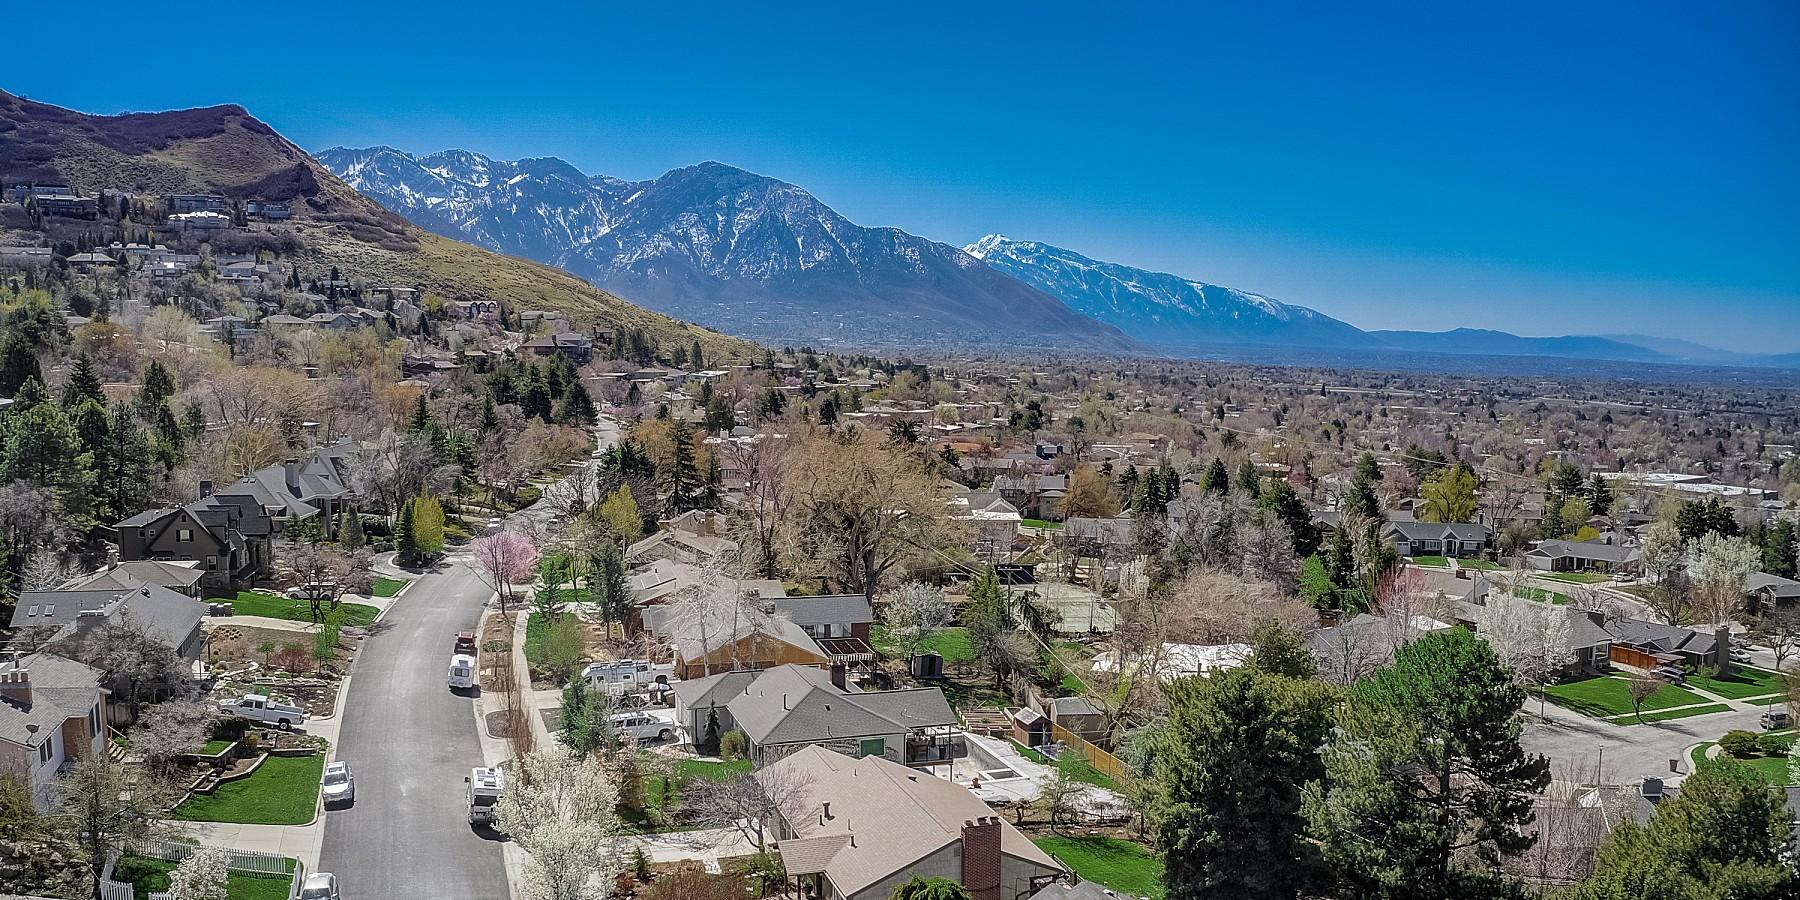 1526 S. Wasatch Drive, Salt Lake City, UT 84108